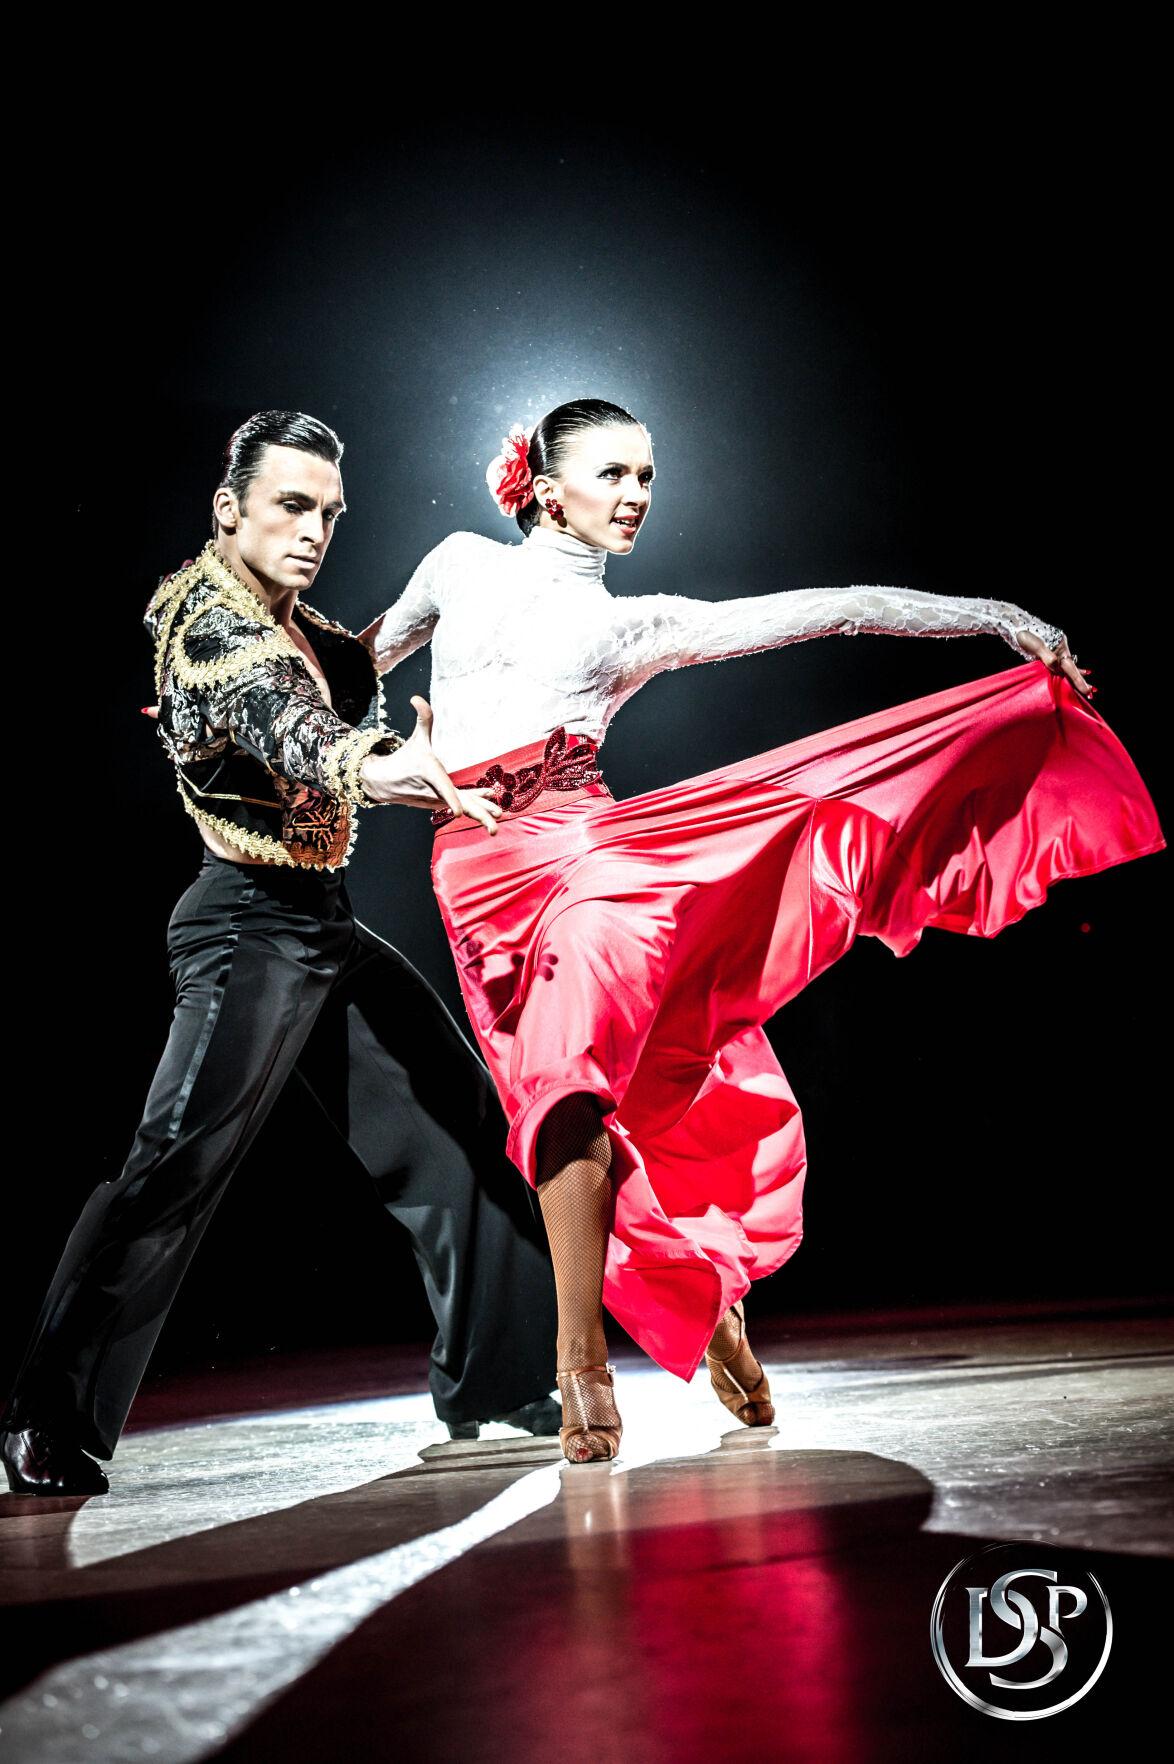 050521-cr-dancers